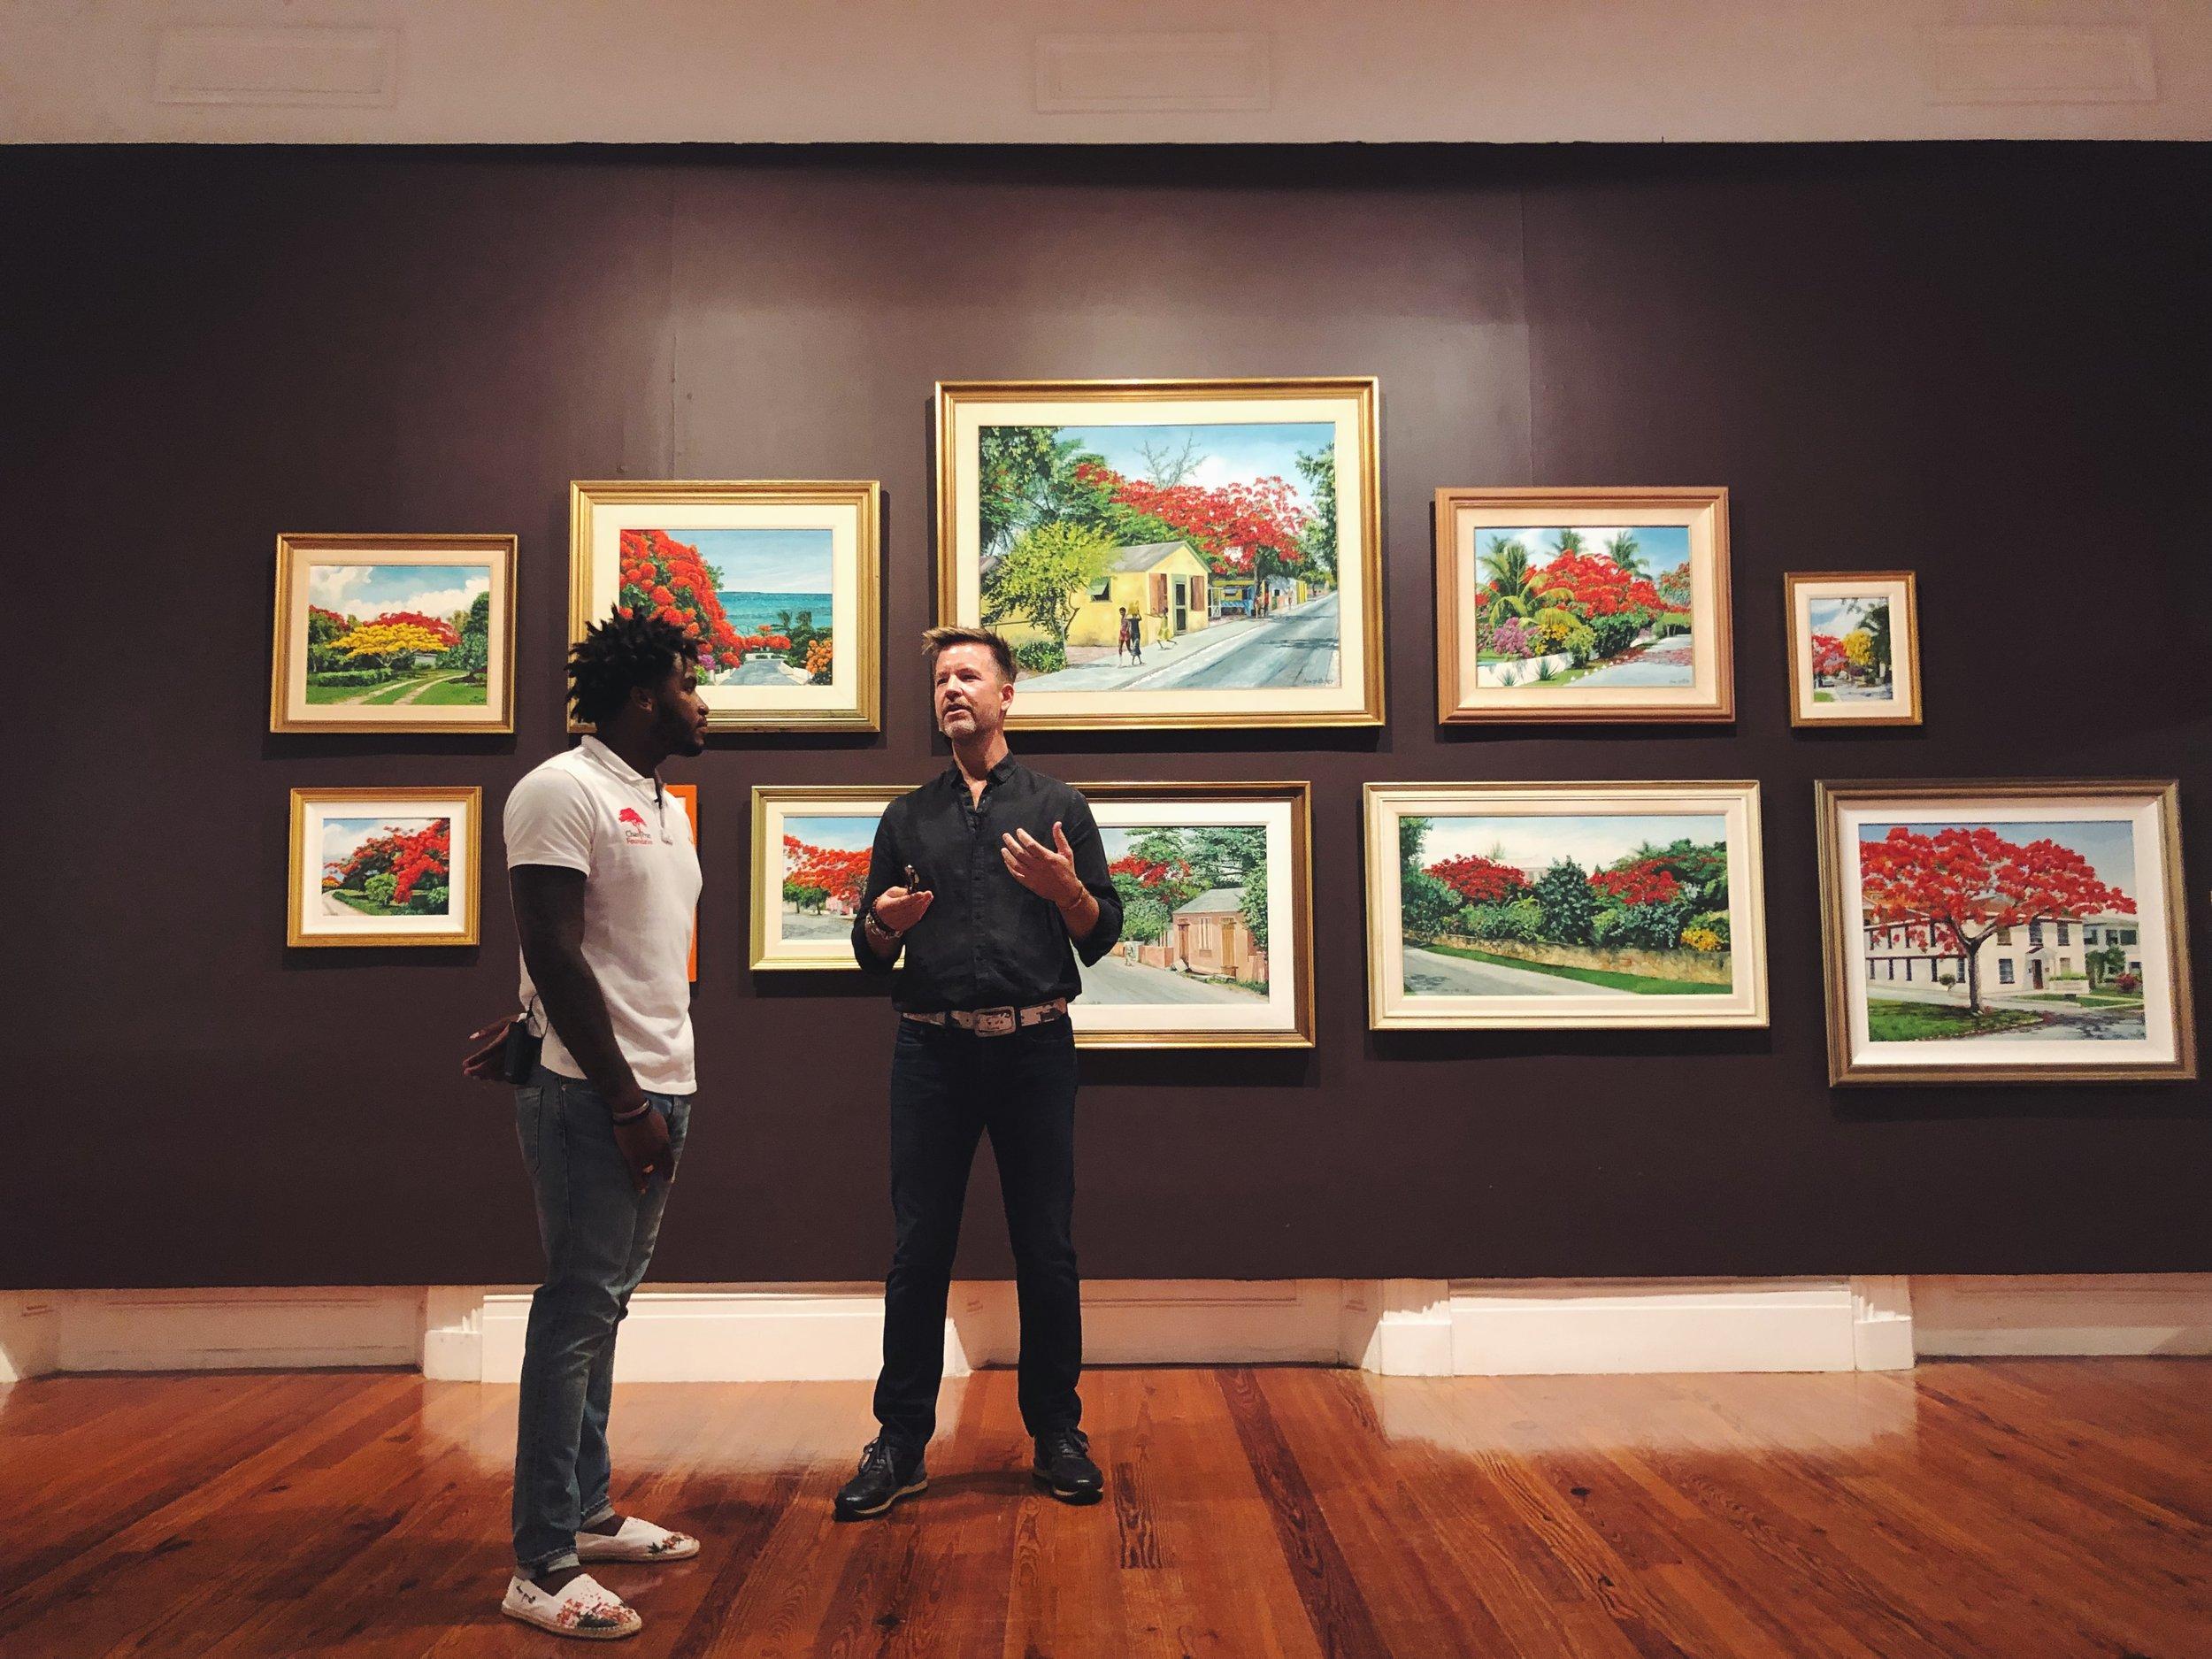 Fond flames of summer by Master Artist, Chan Pratt through the eyes of his son - DC Pratt.